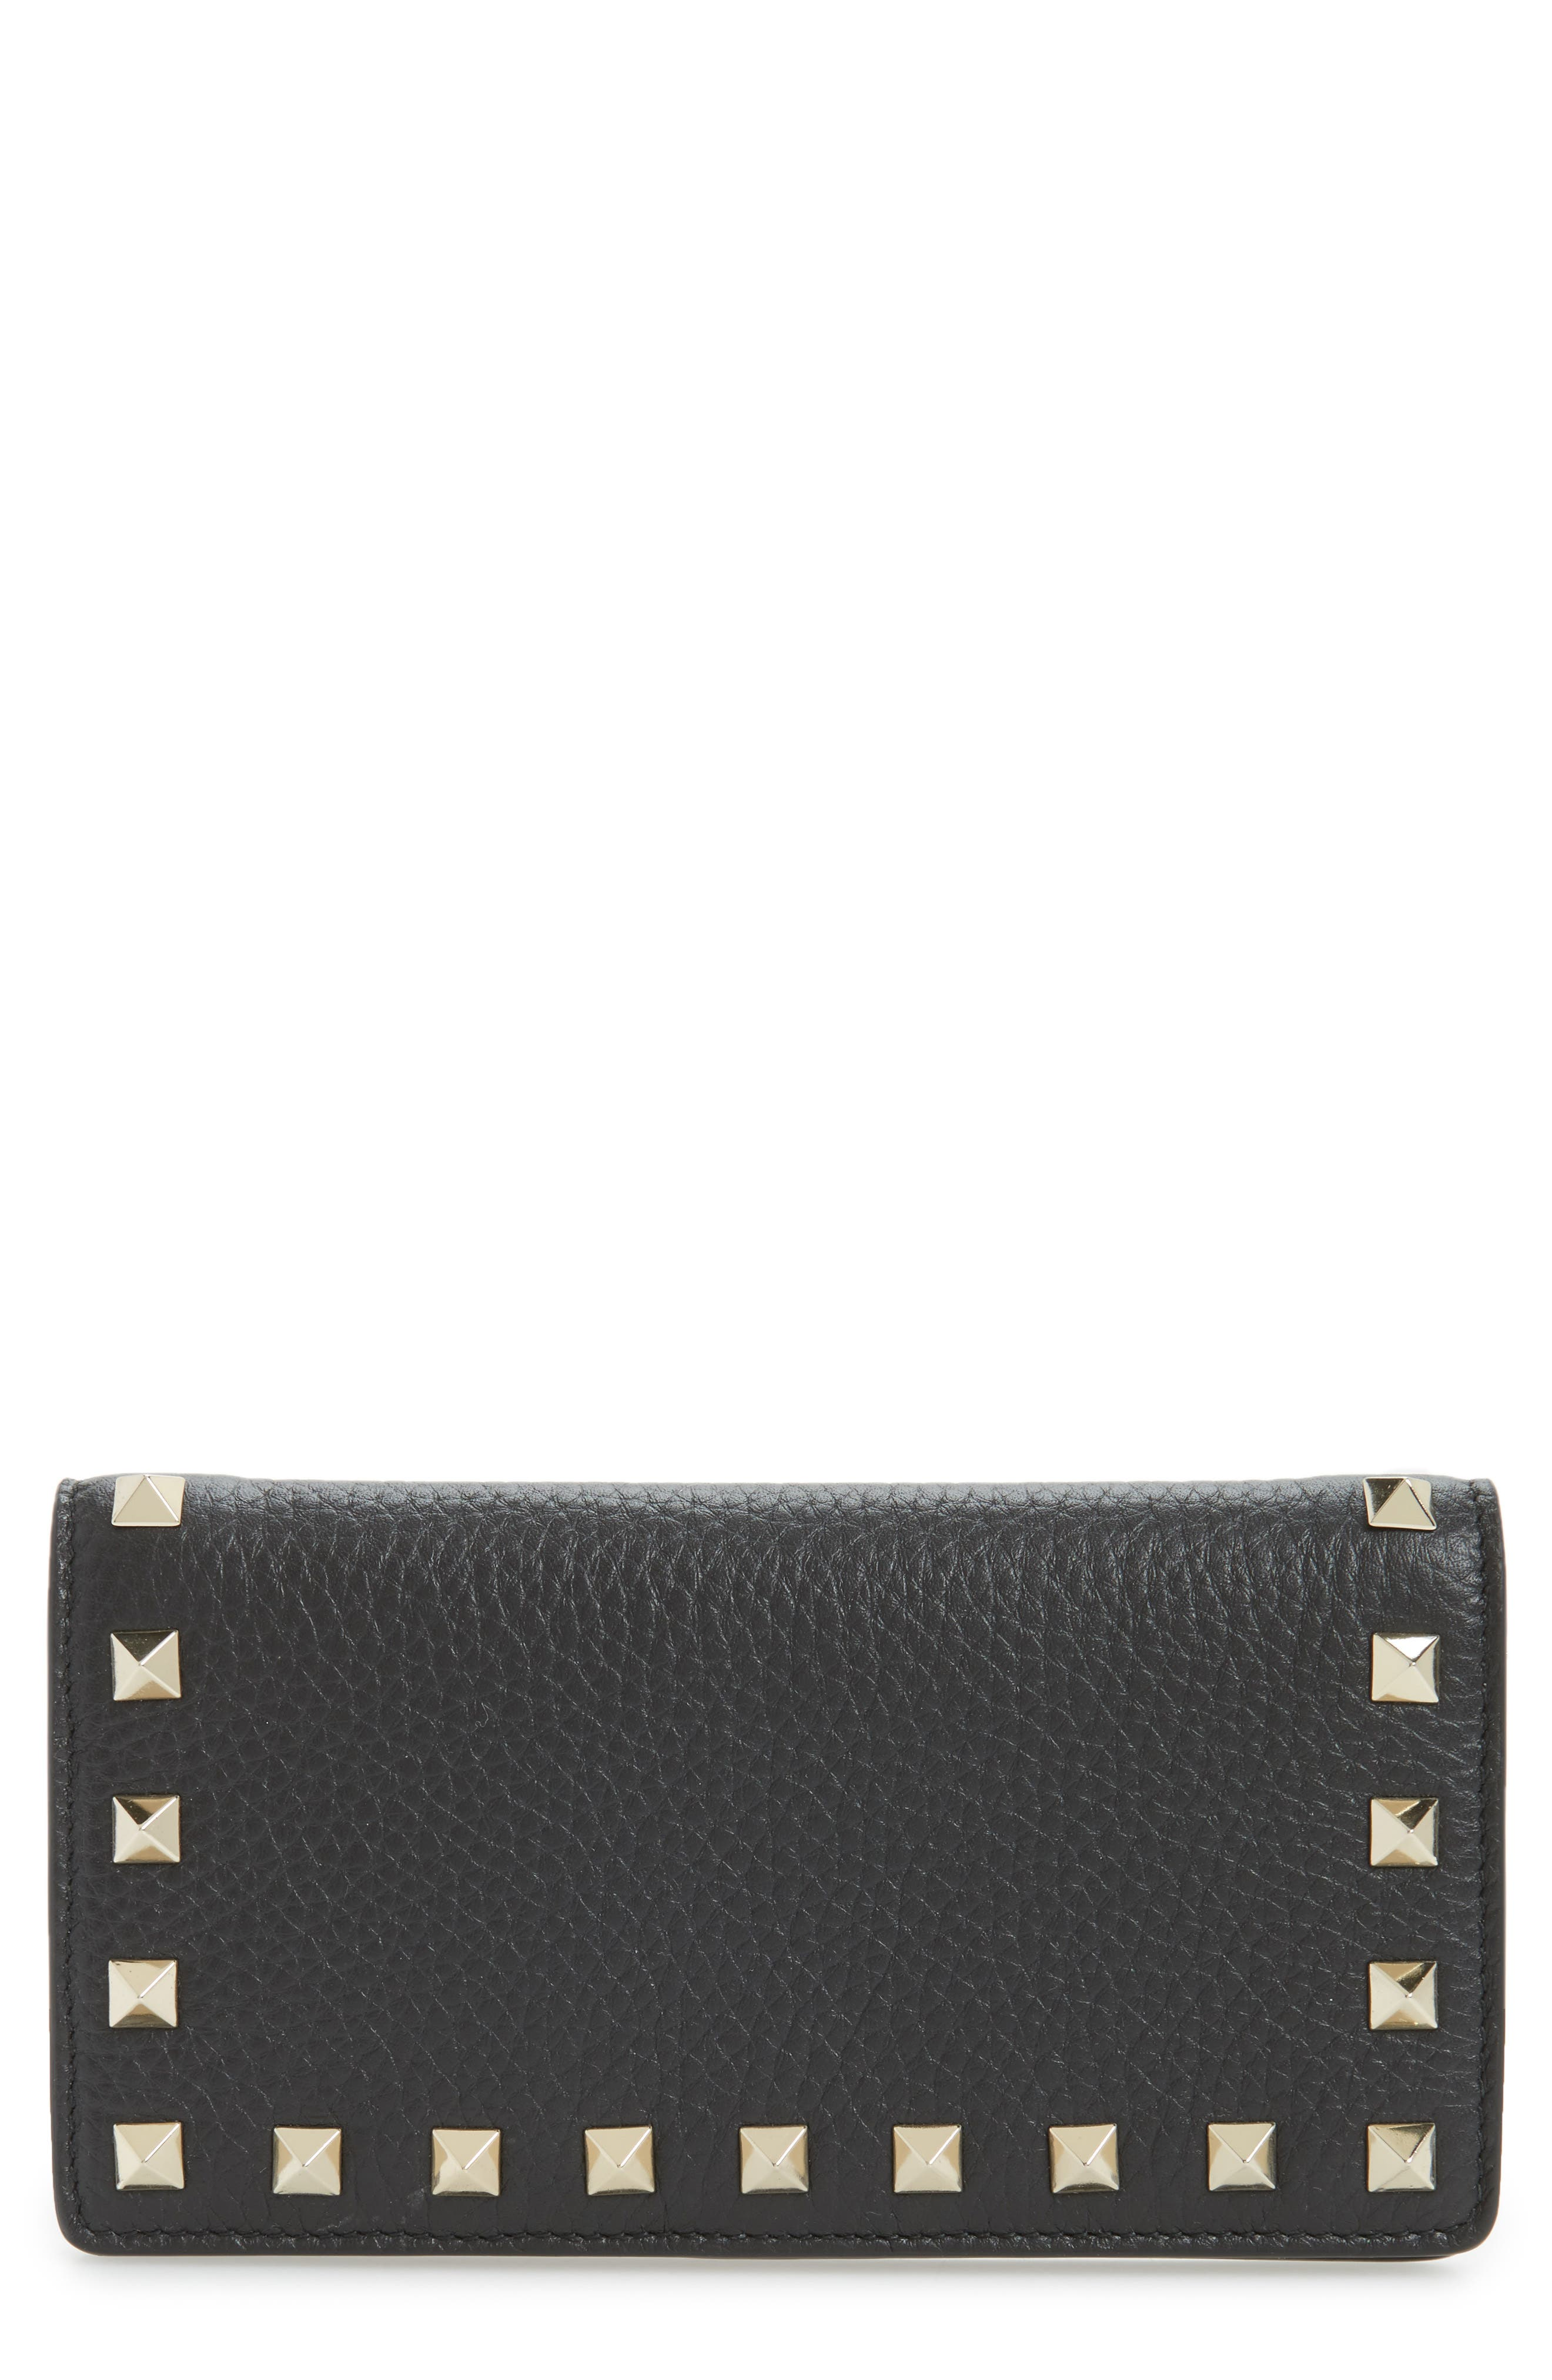 VALENTINO GARAVANI Rockstud Calfskin Leather Wallet